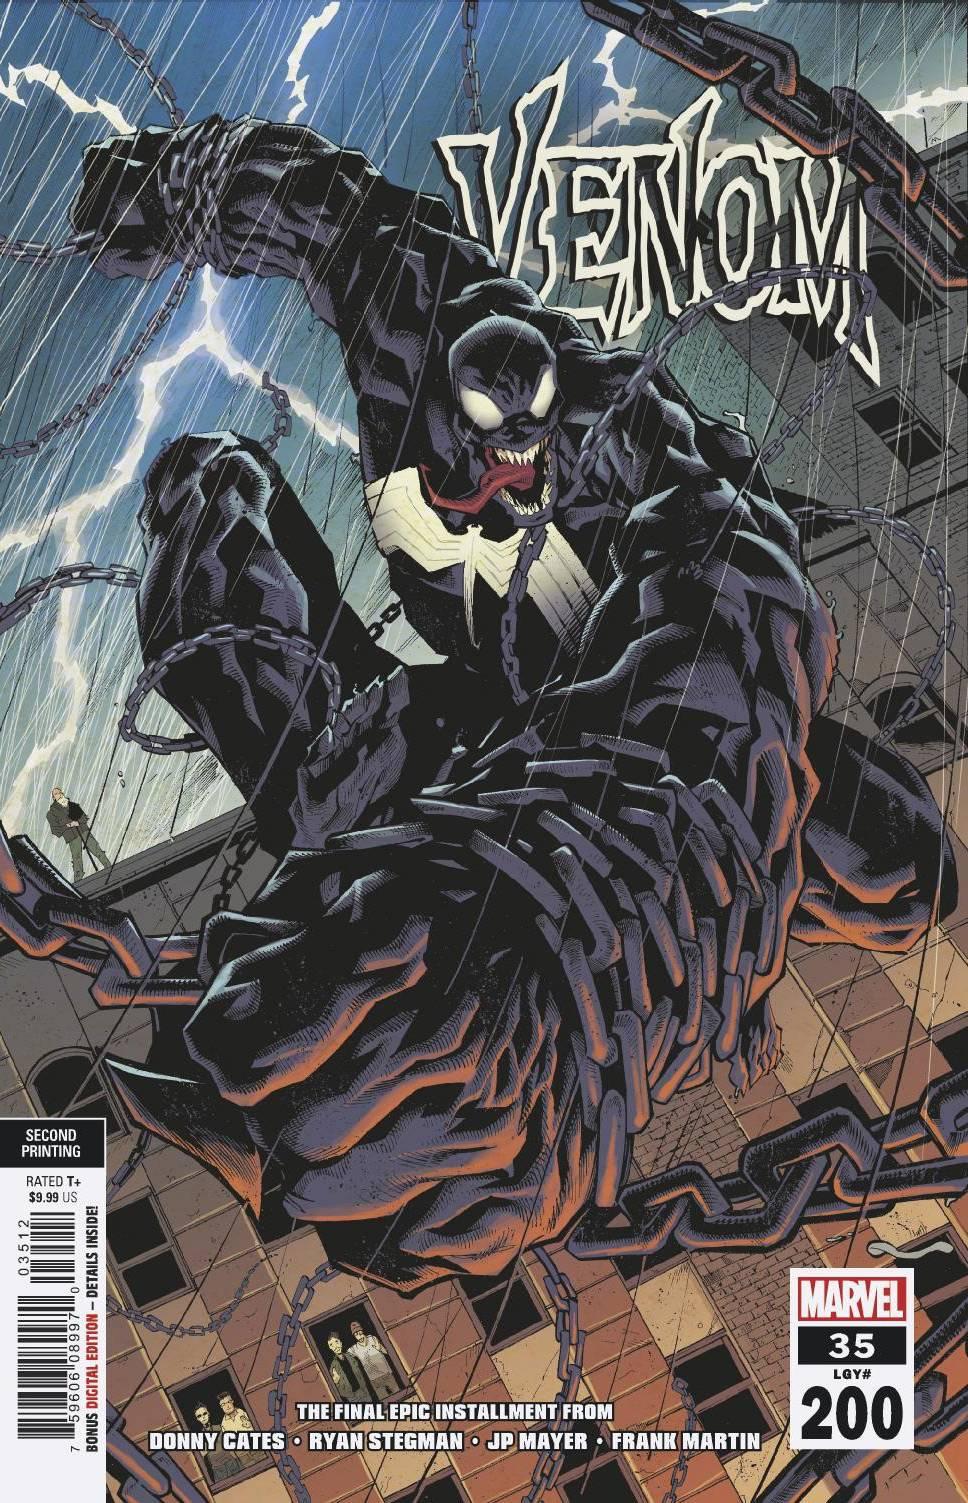 STL201752 ComicList: Marvel Comics New Releases for 08/04/2021